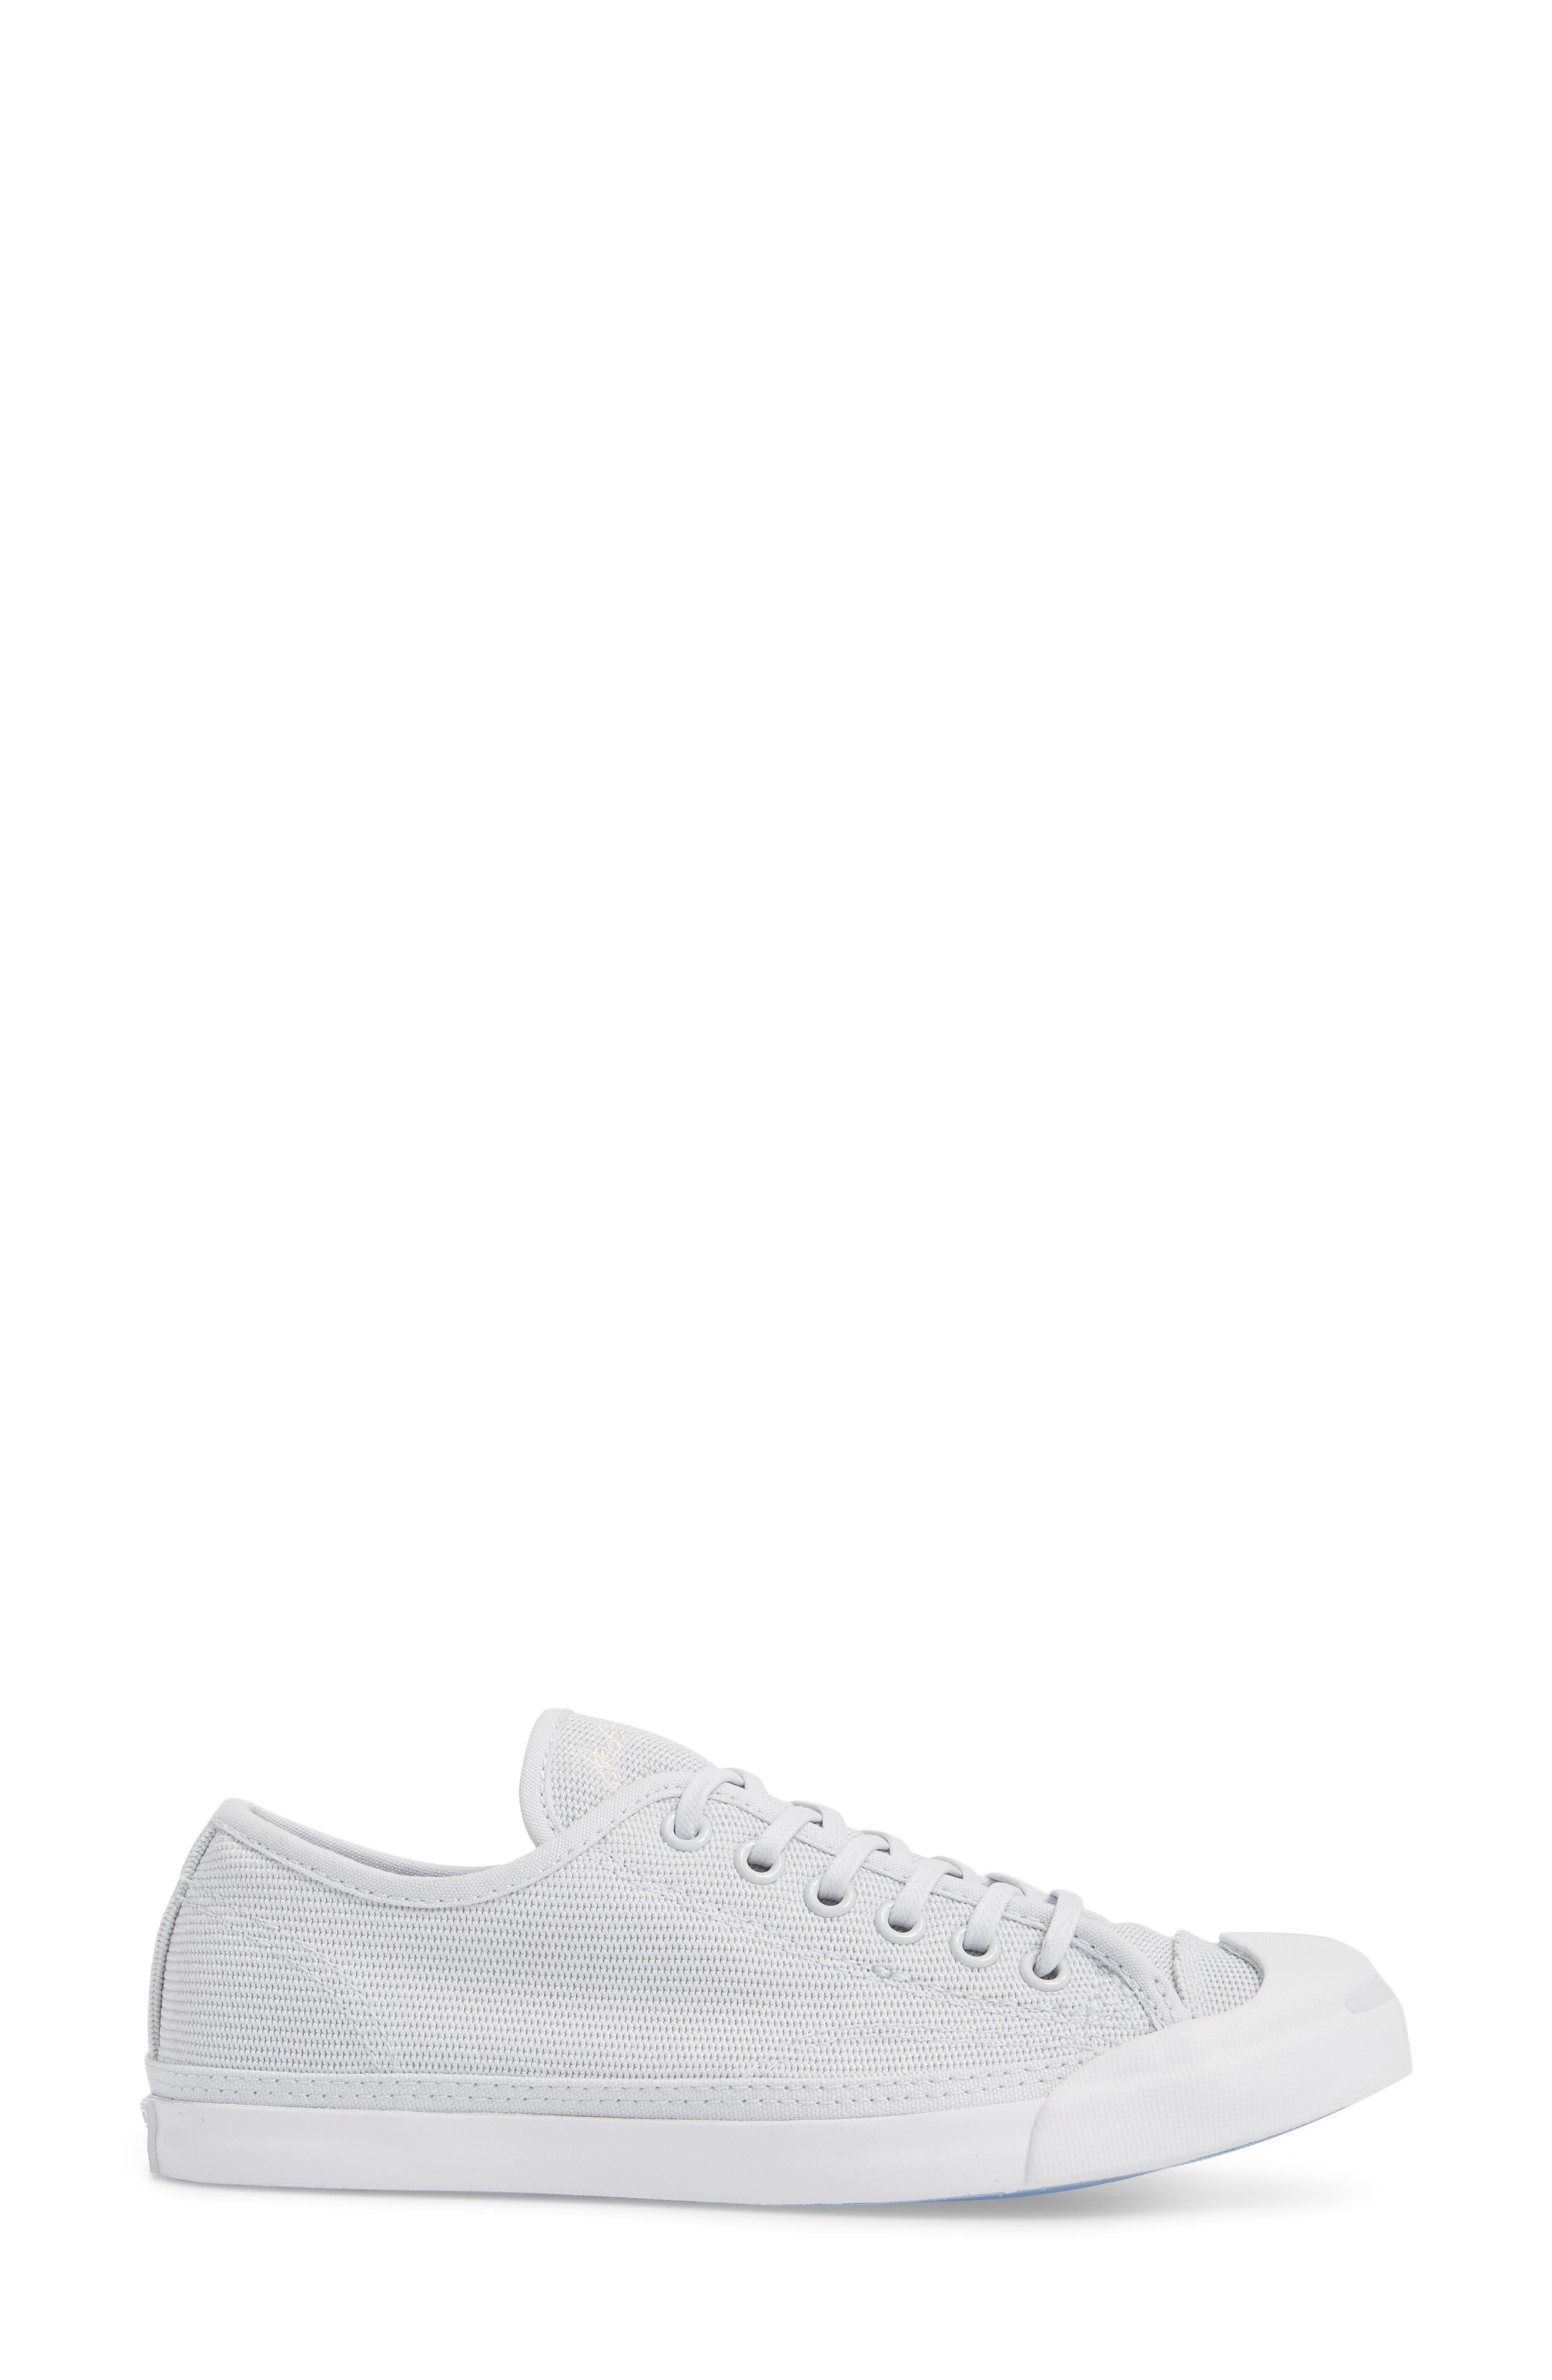 Jack Purcell Low Top Sneaker,                             Alternate thumbnail 3, color,                             PURE PLATINUM